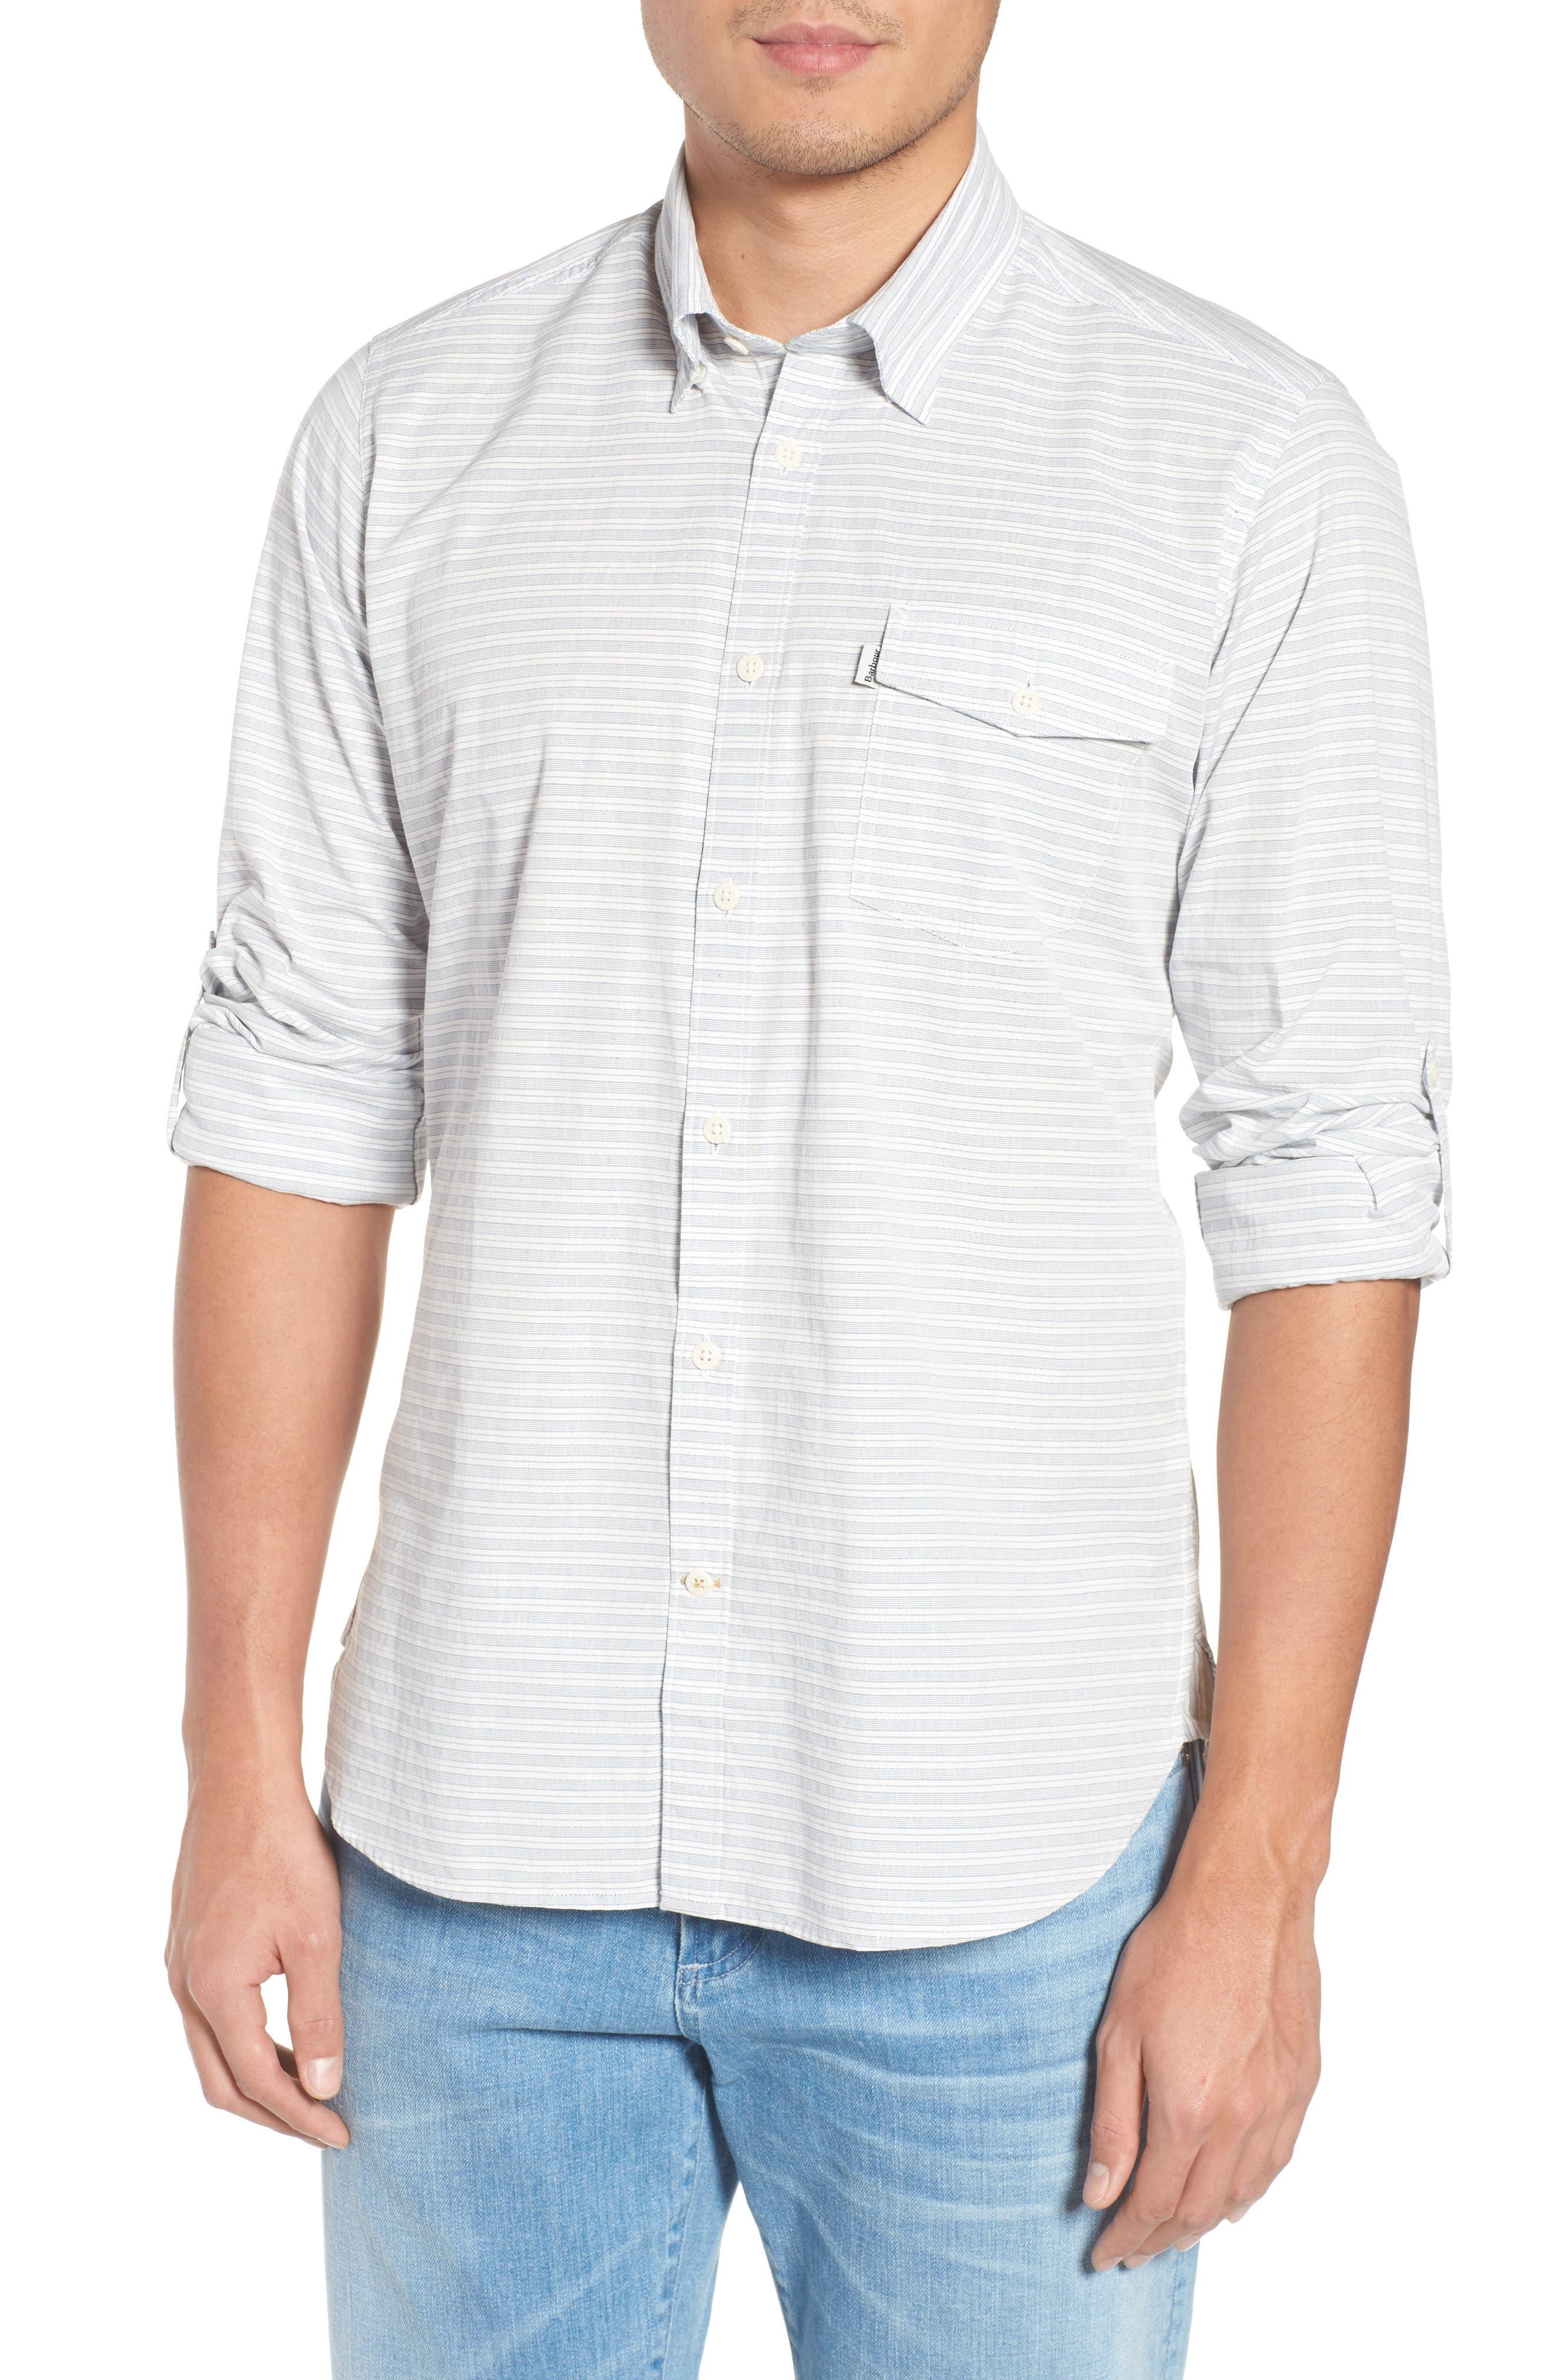 Huchen Regular Fit Stripe Sport Shirt,                             Main thumbnail 1, color,                             White